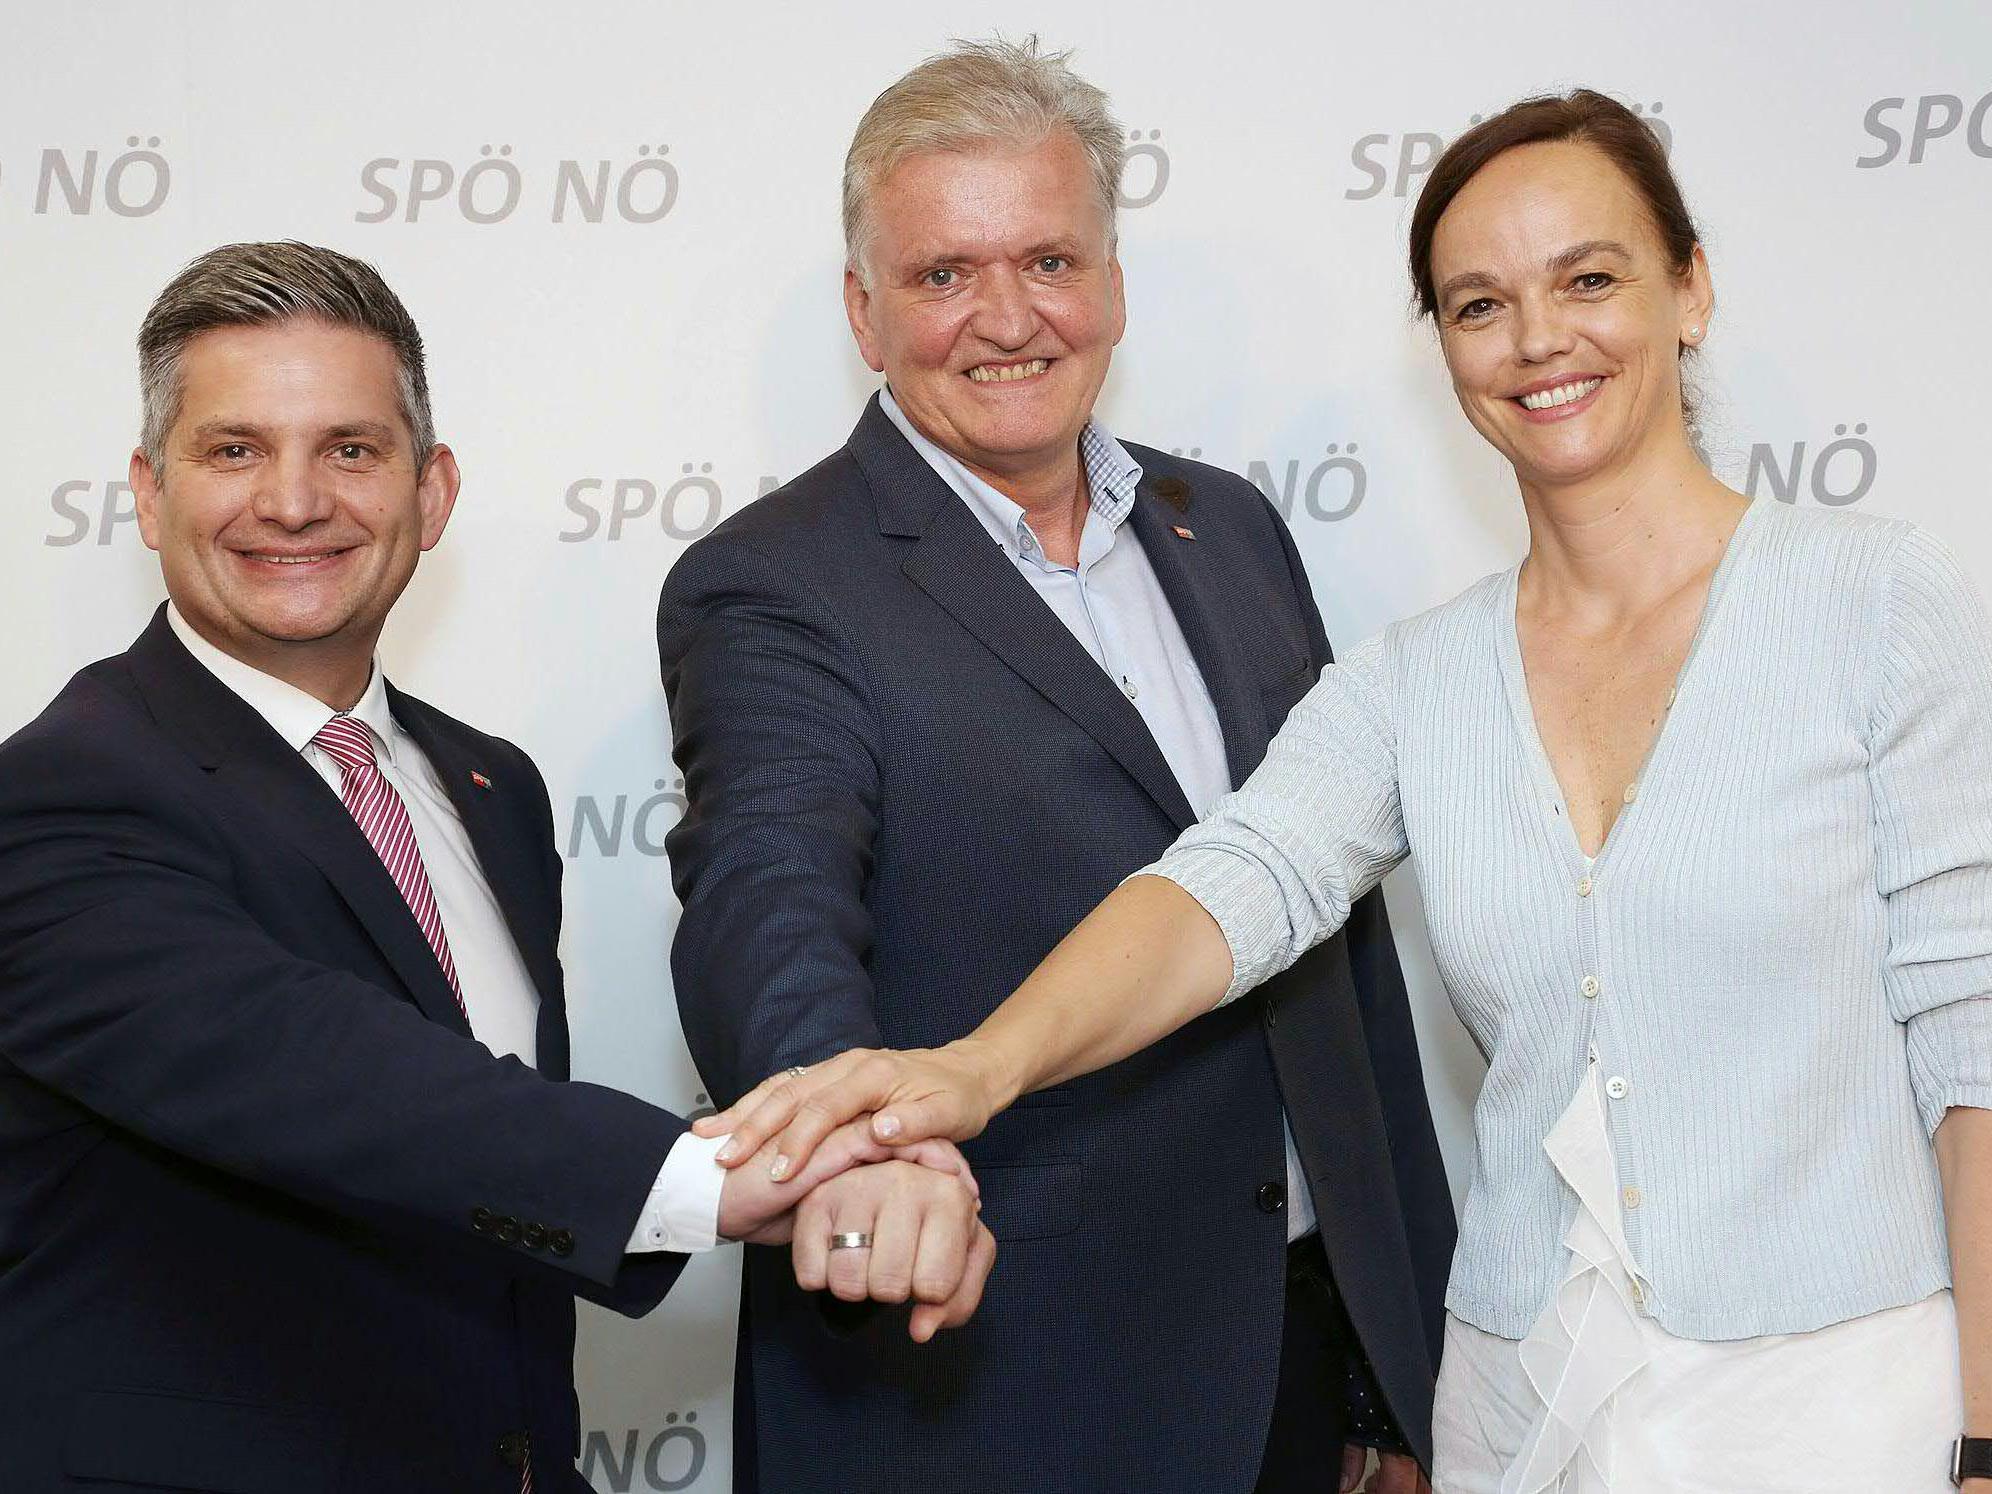 (v.l.n.r.) SPÖ-Landesrat Maurice Androsch, SPÖ-Landesparteivorsitzender Franz Schnabl und Bildungsministerin Sonja Hammerschmid